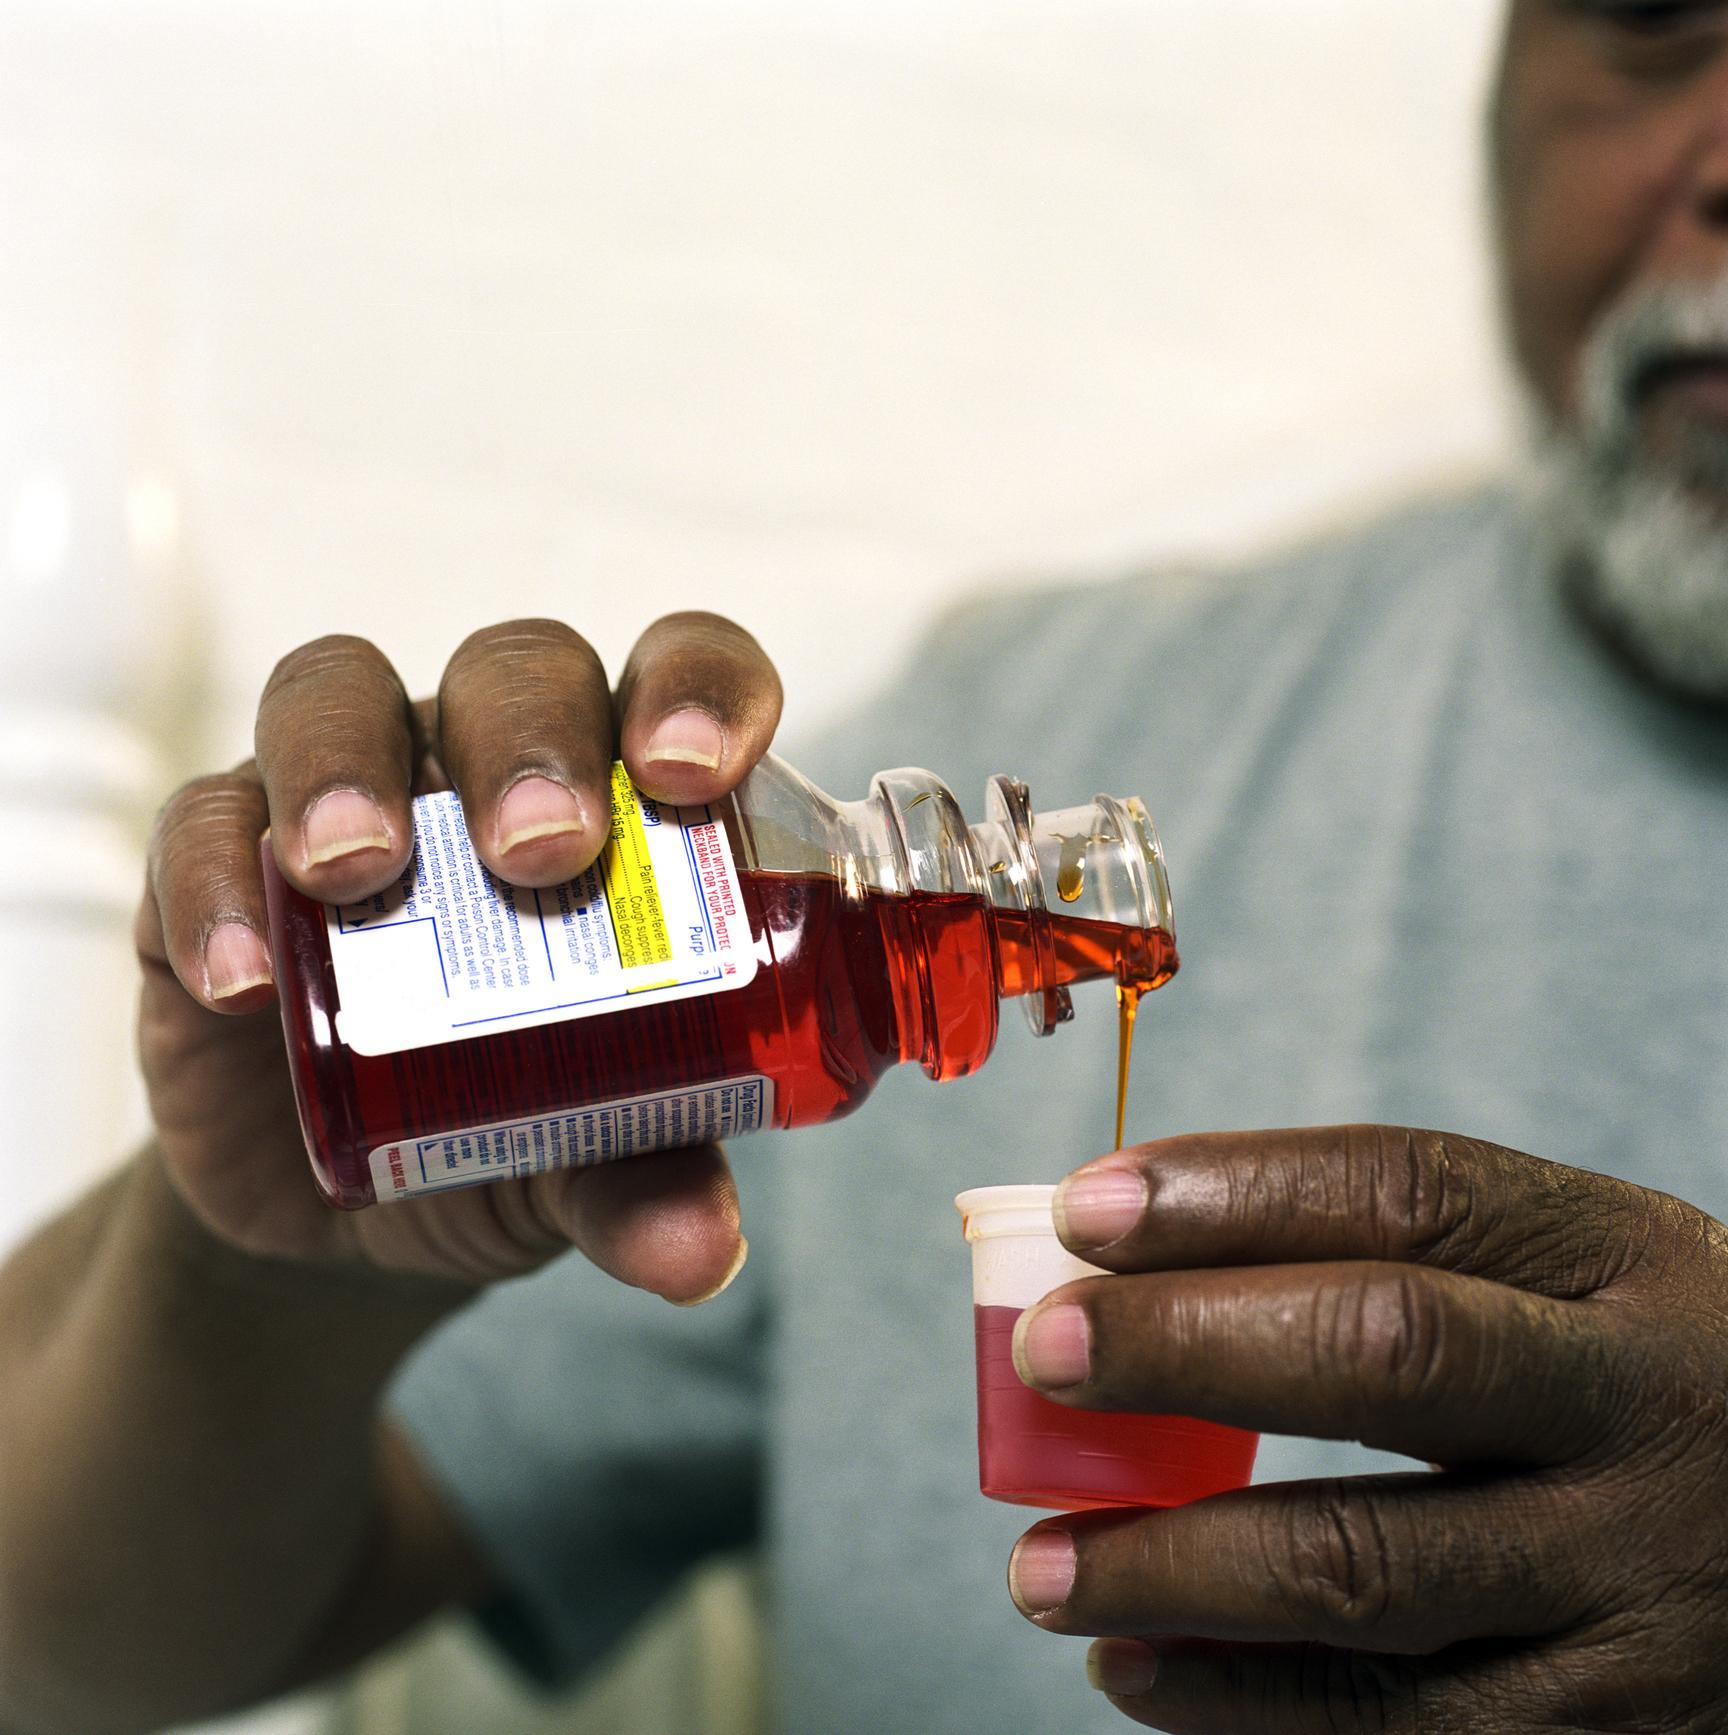 Man pour cold medicine into measuring cup